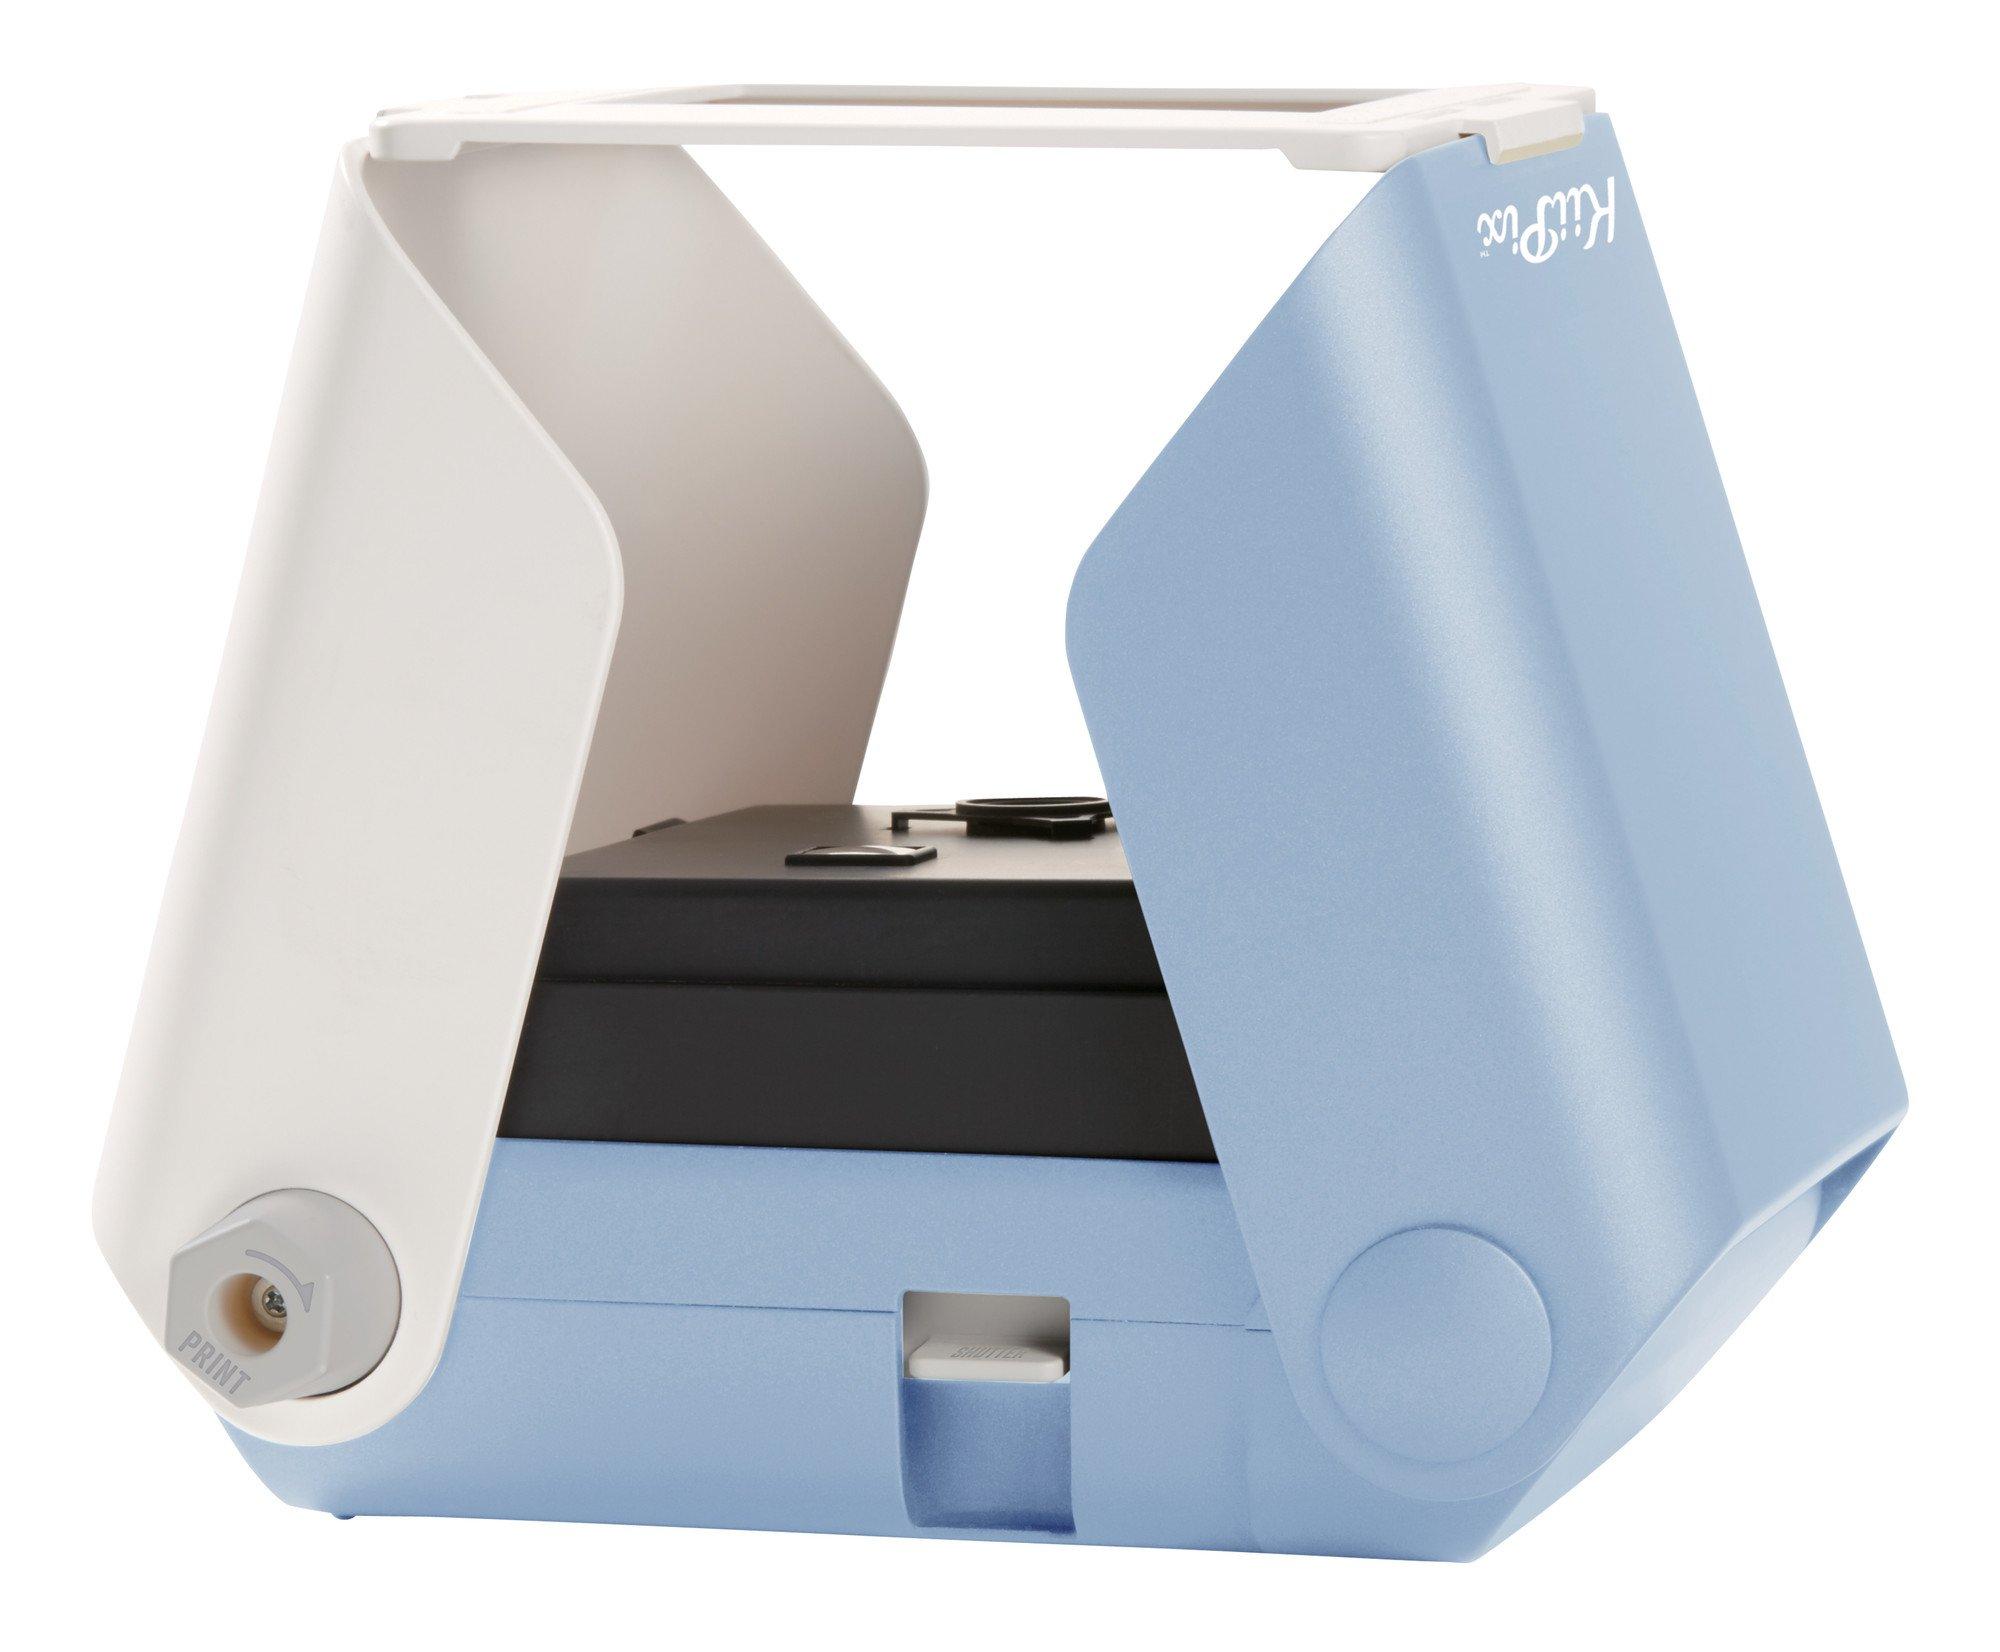 KiiPix Smartphone Picture Printer, Blue